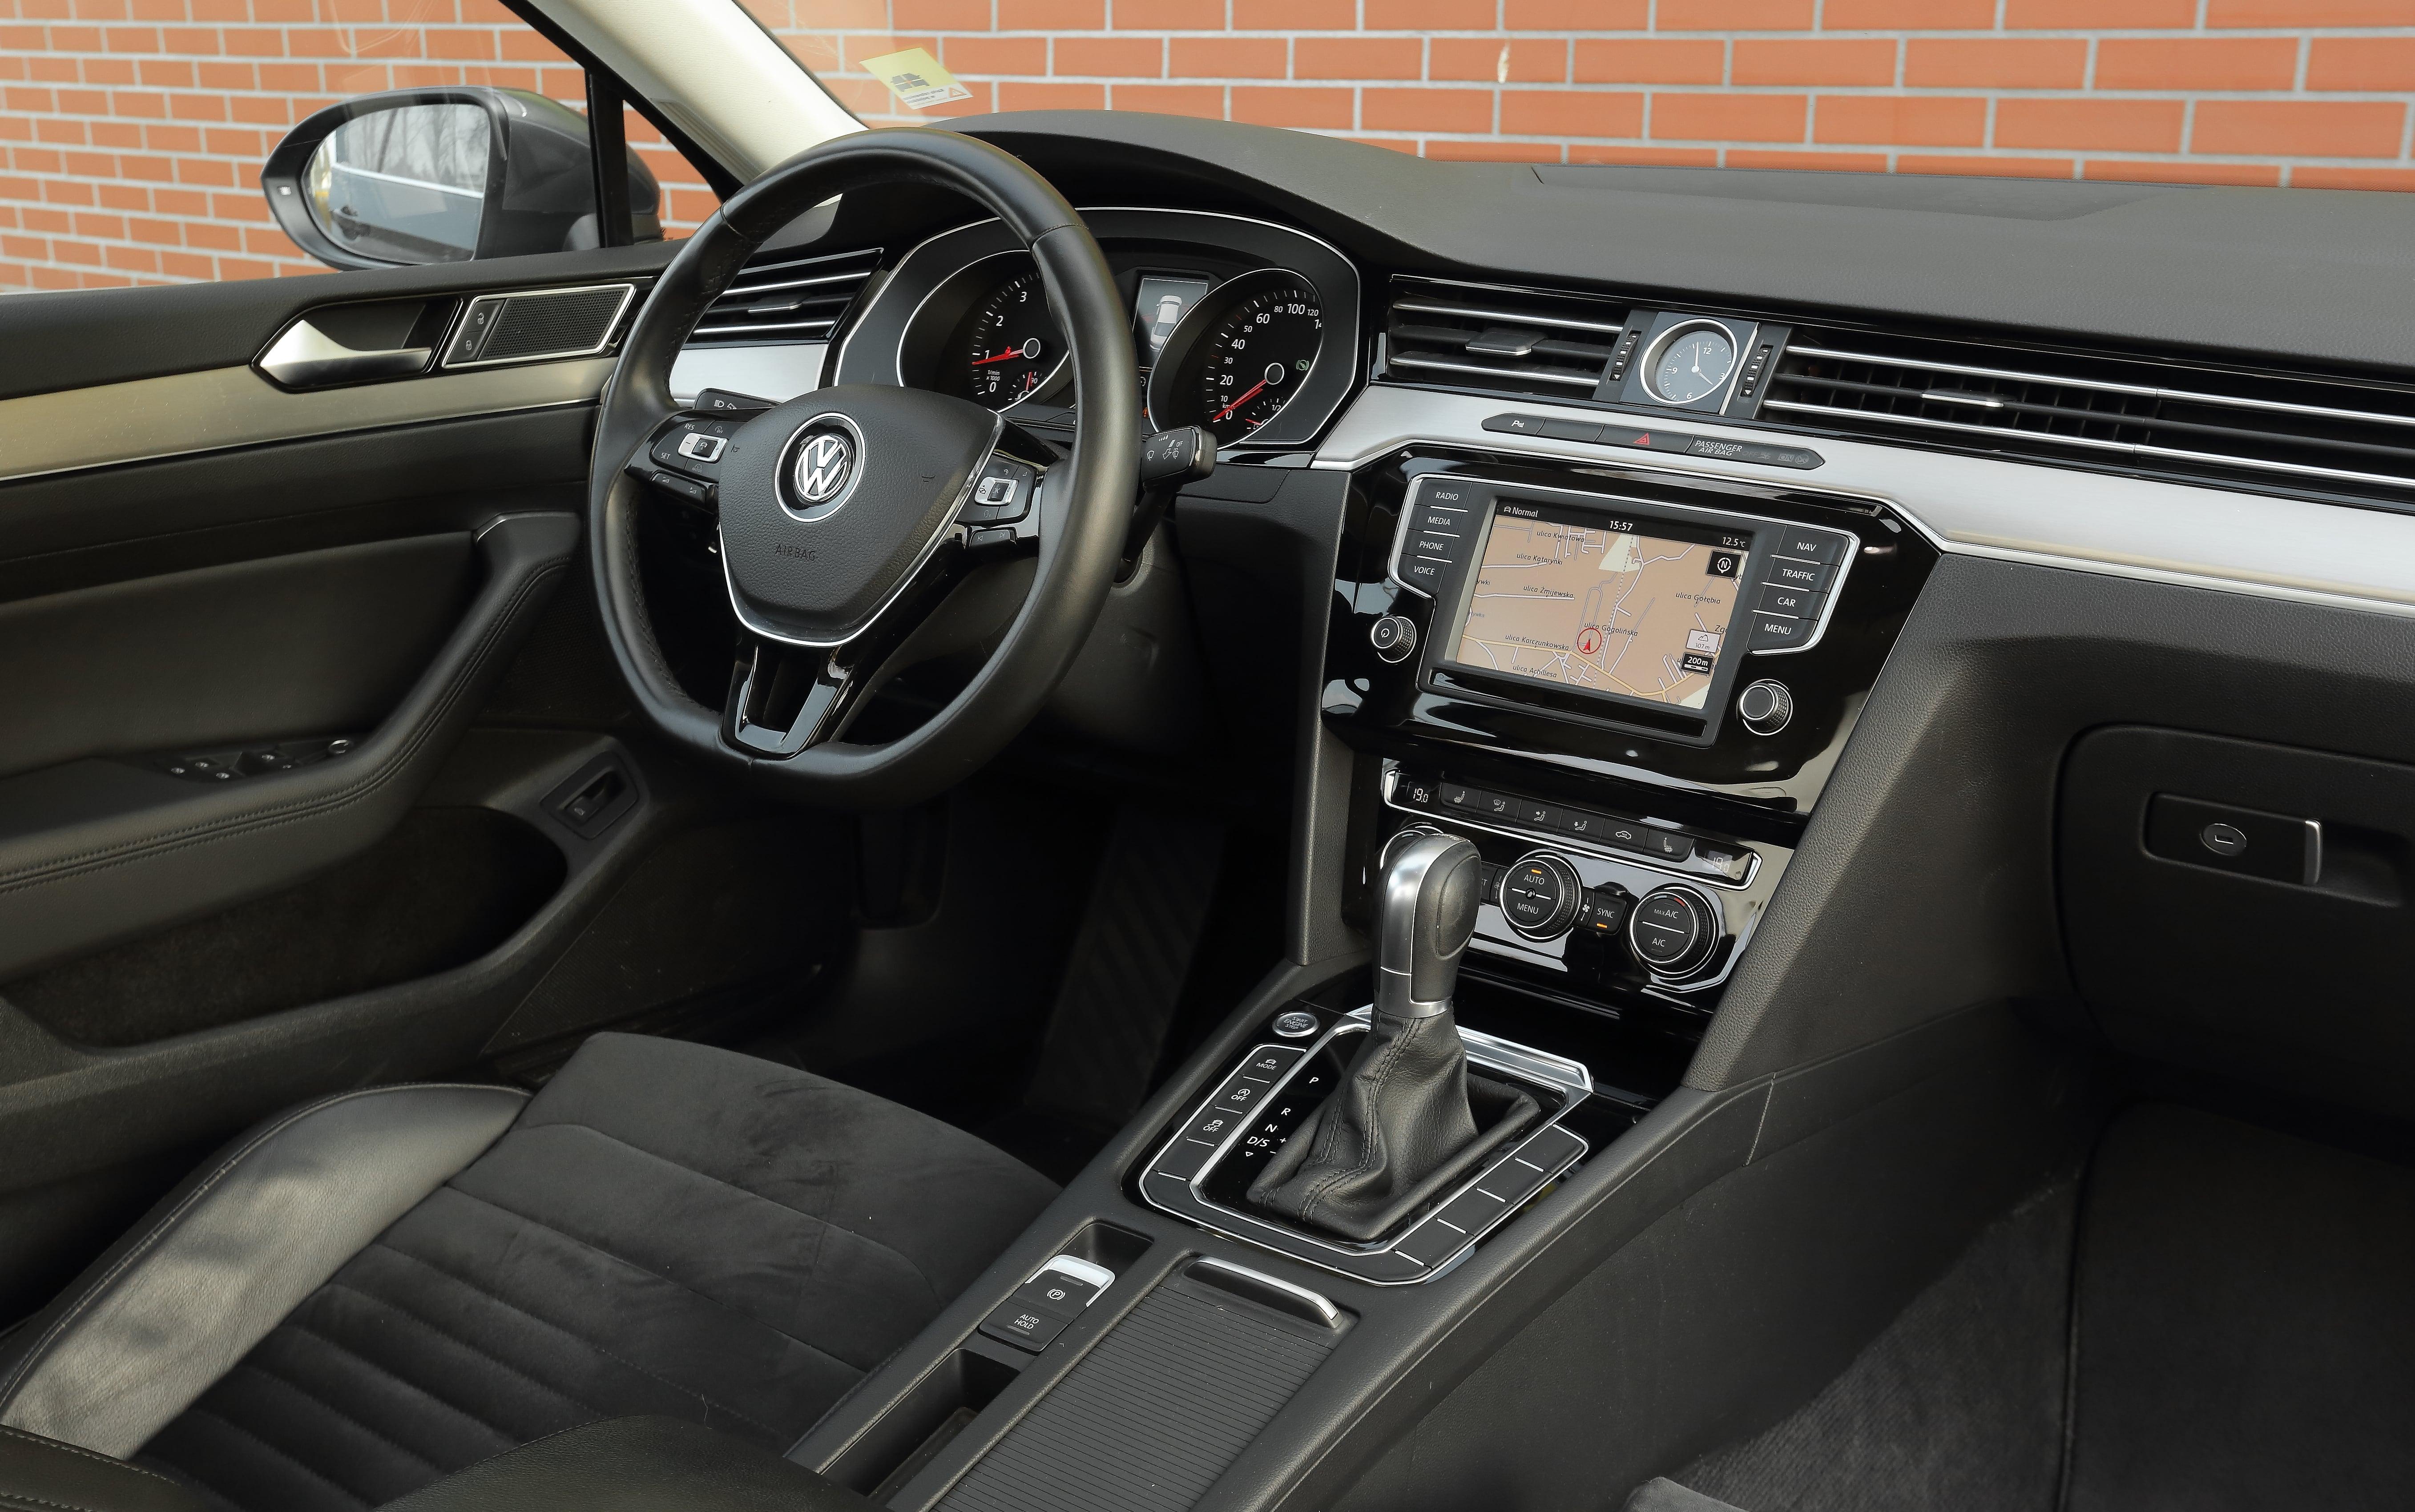 Volkswagen Passat (B8) 1.8 TSI deska rozdzielcza